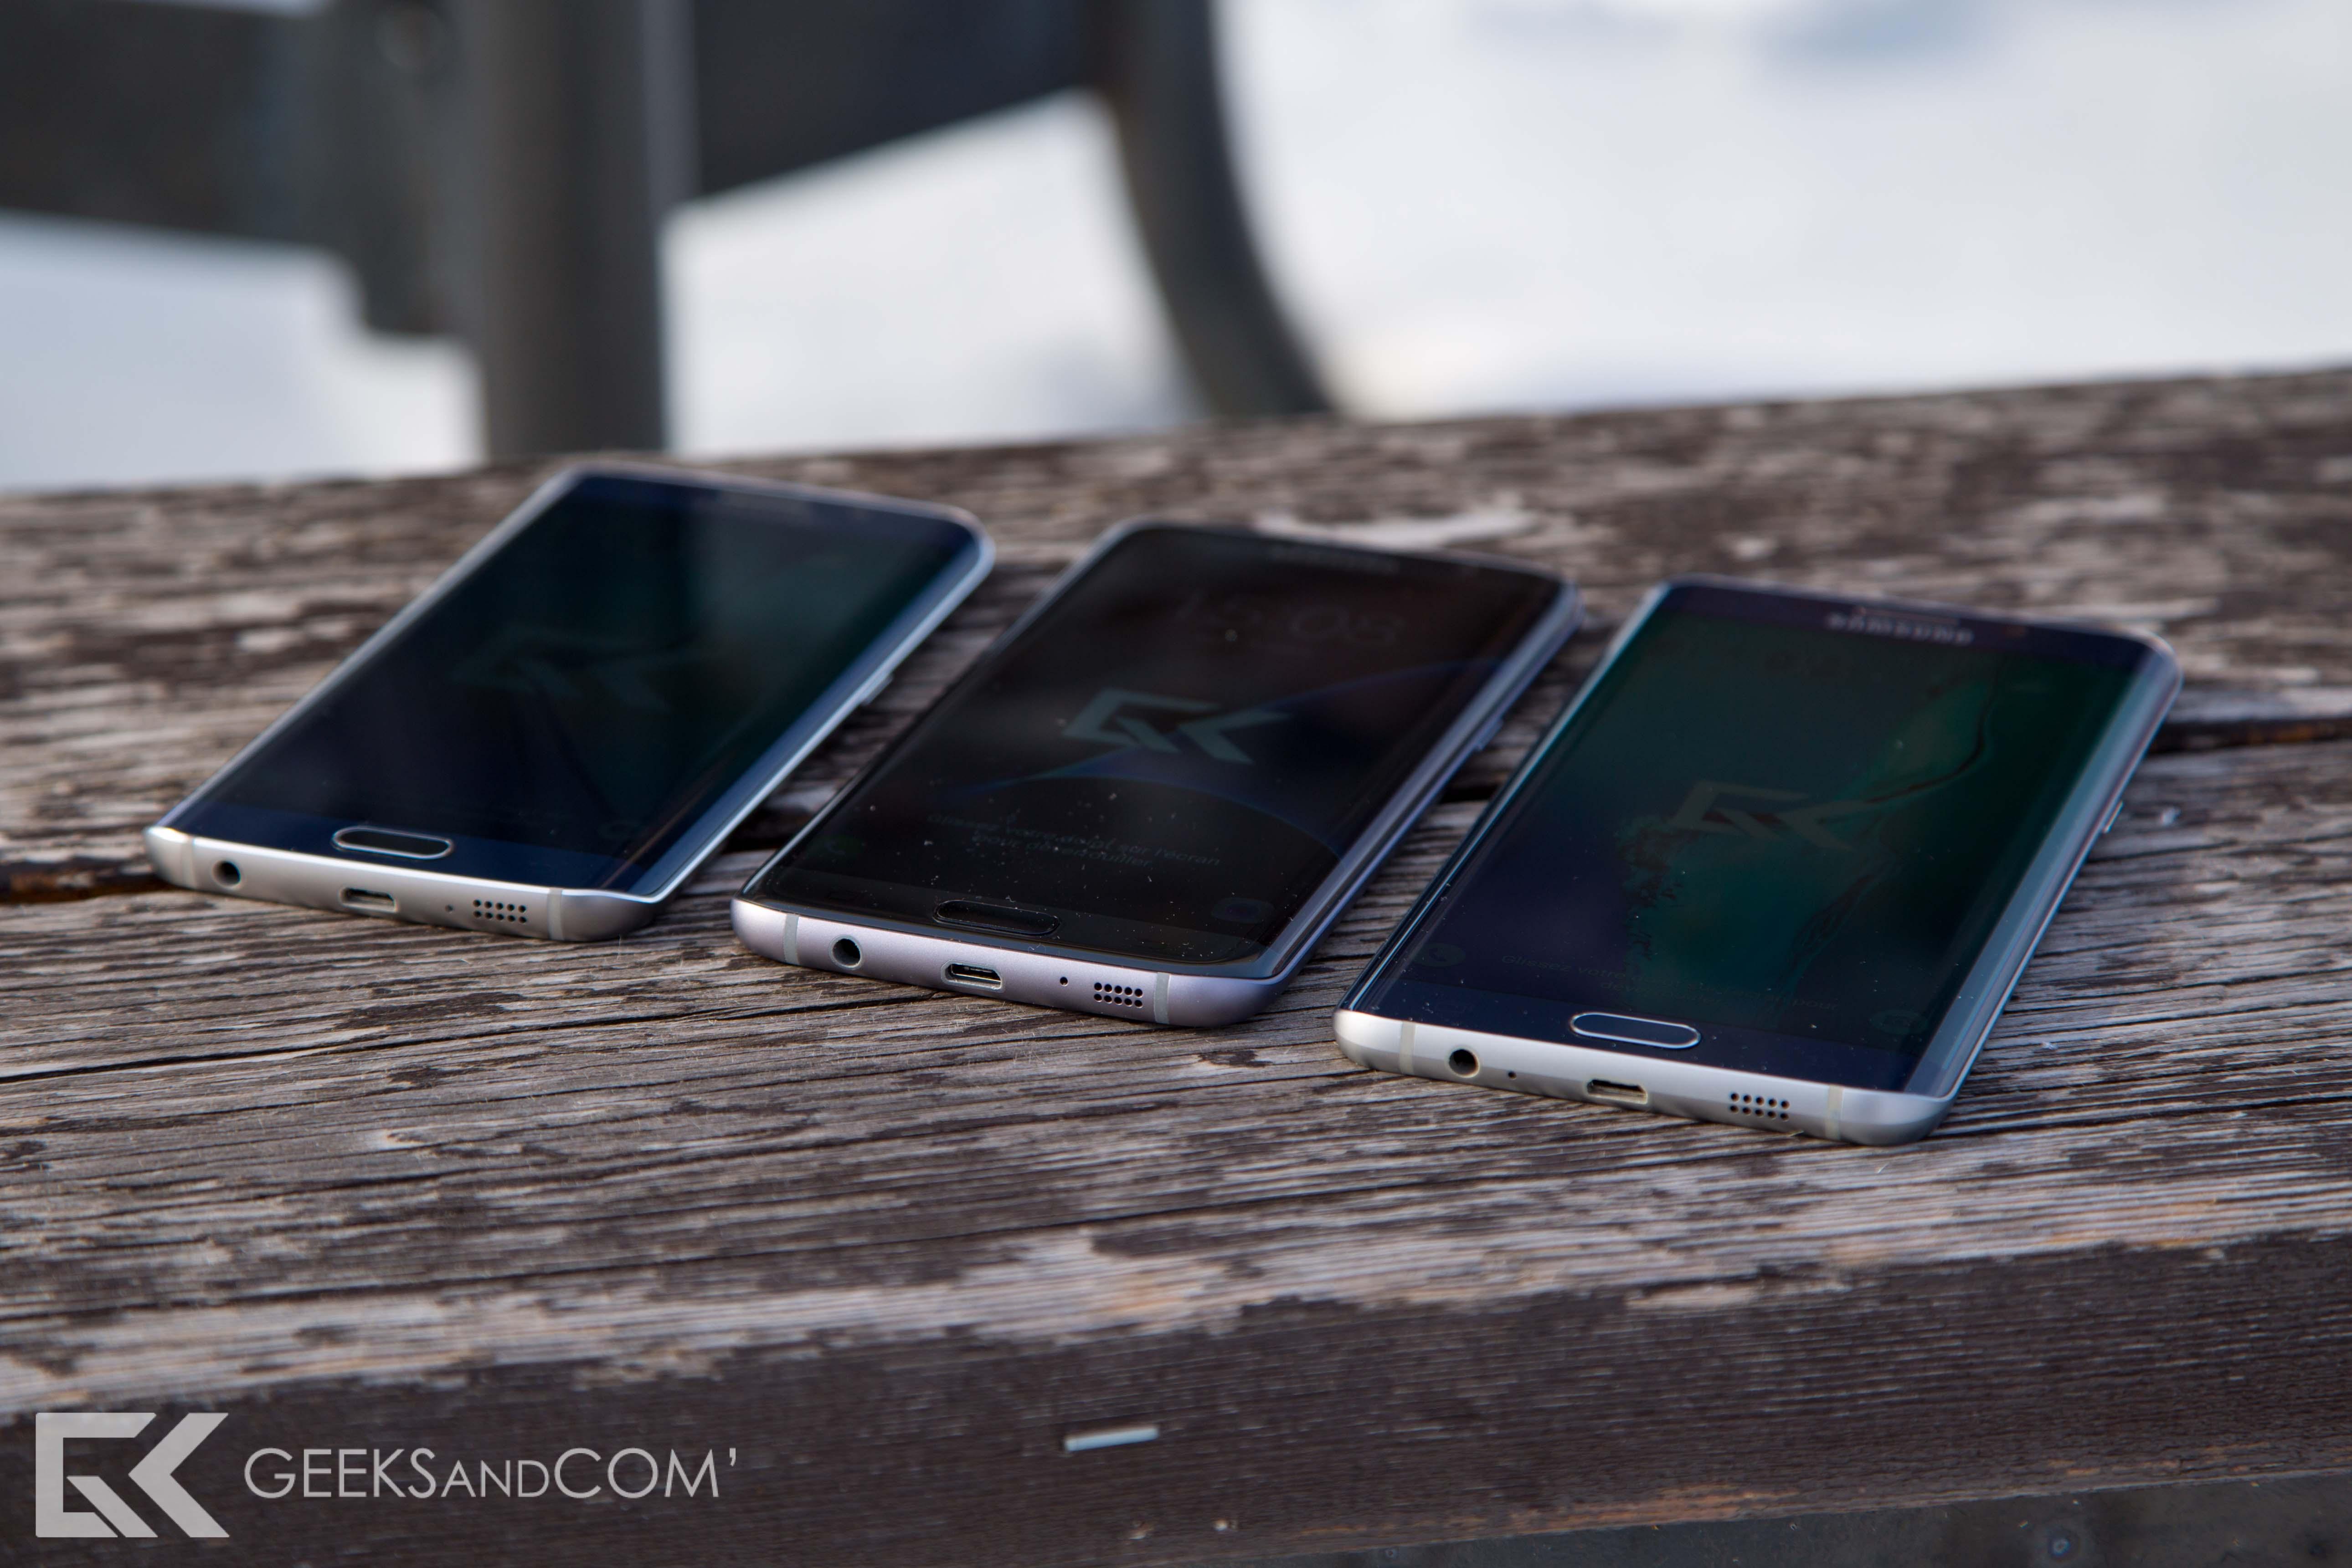 Samsung Galaxy S6 edge vs S7 edge vs S6 edge plus - Test Geeks and Com -2